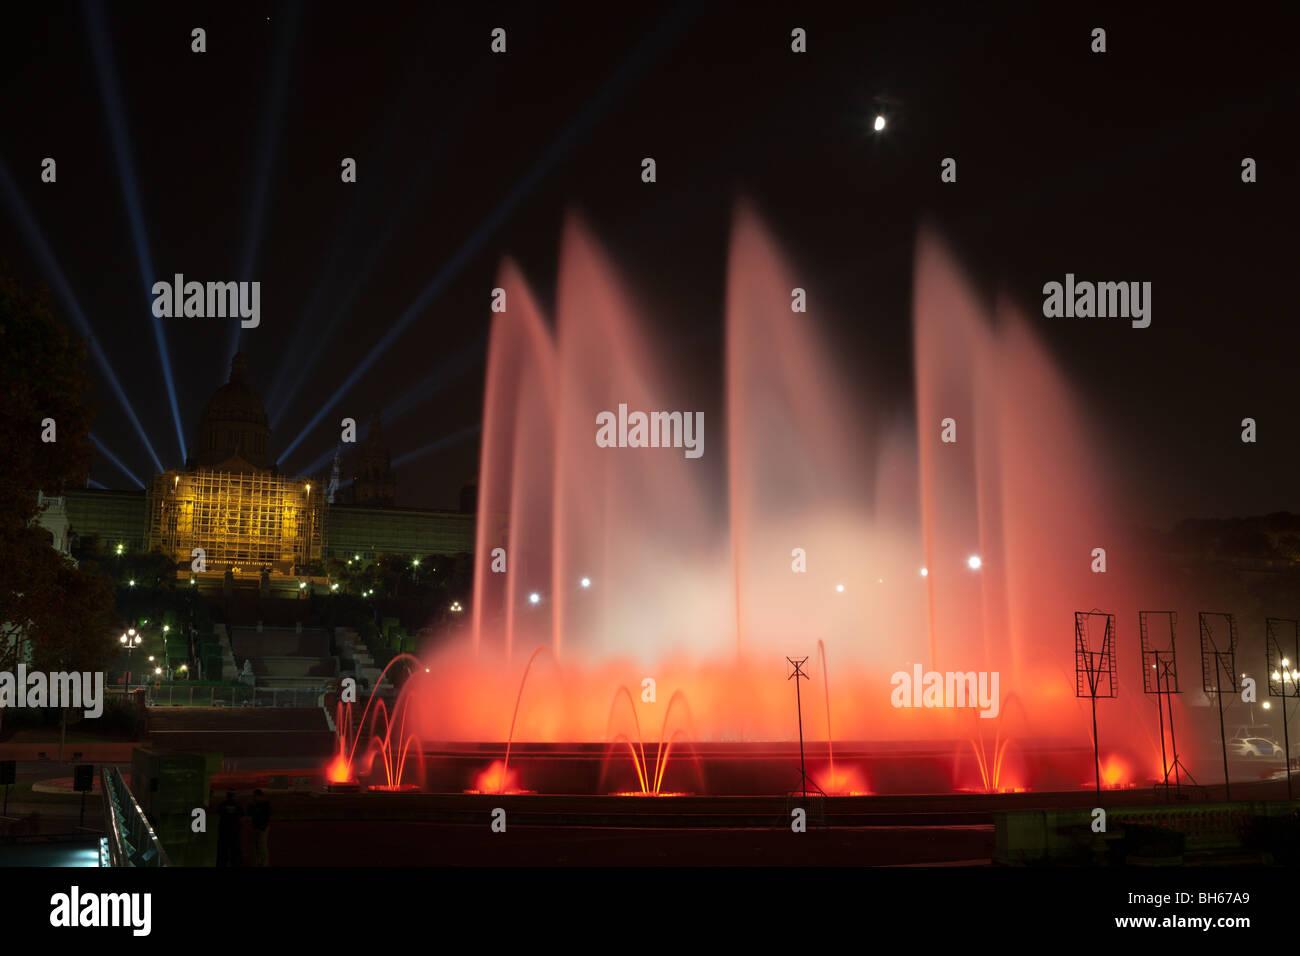 Illuminated Fountain Font Magica at Montjuic, Barcelona, Catalonia, Spain - Stock Image